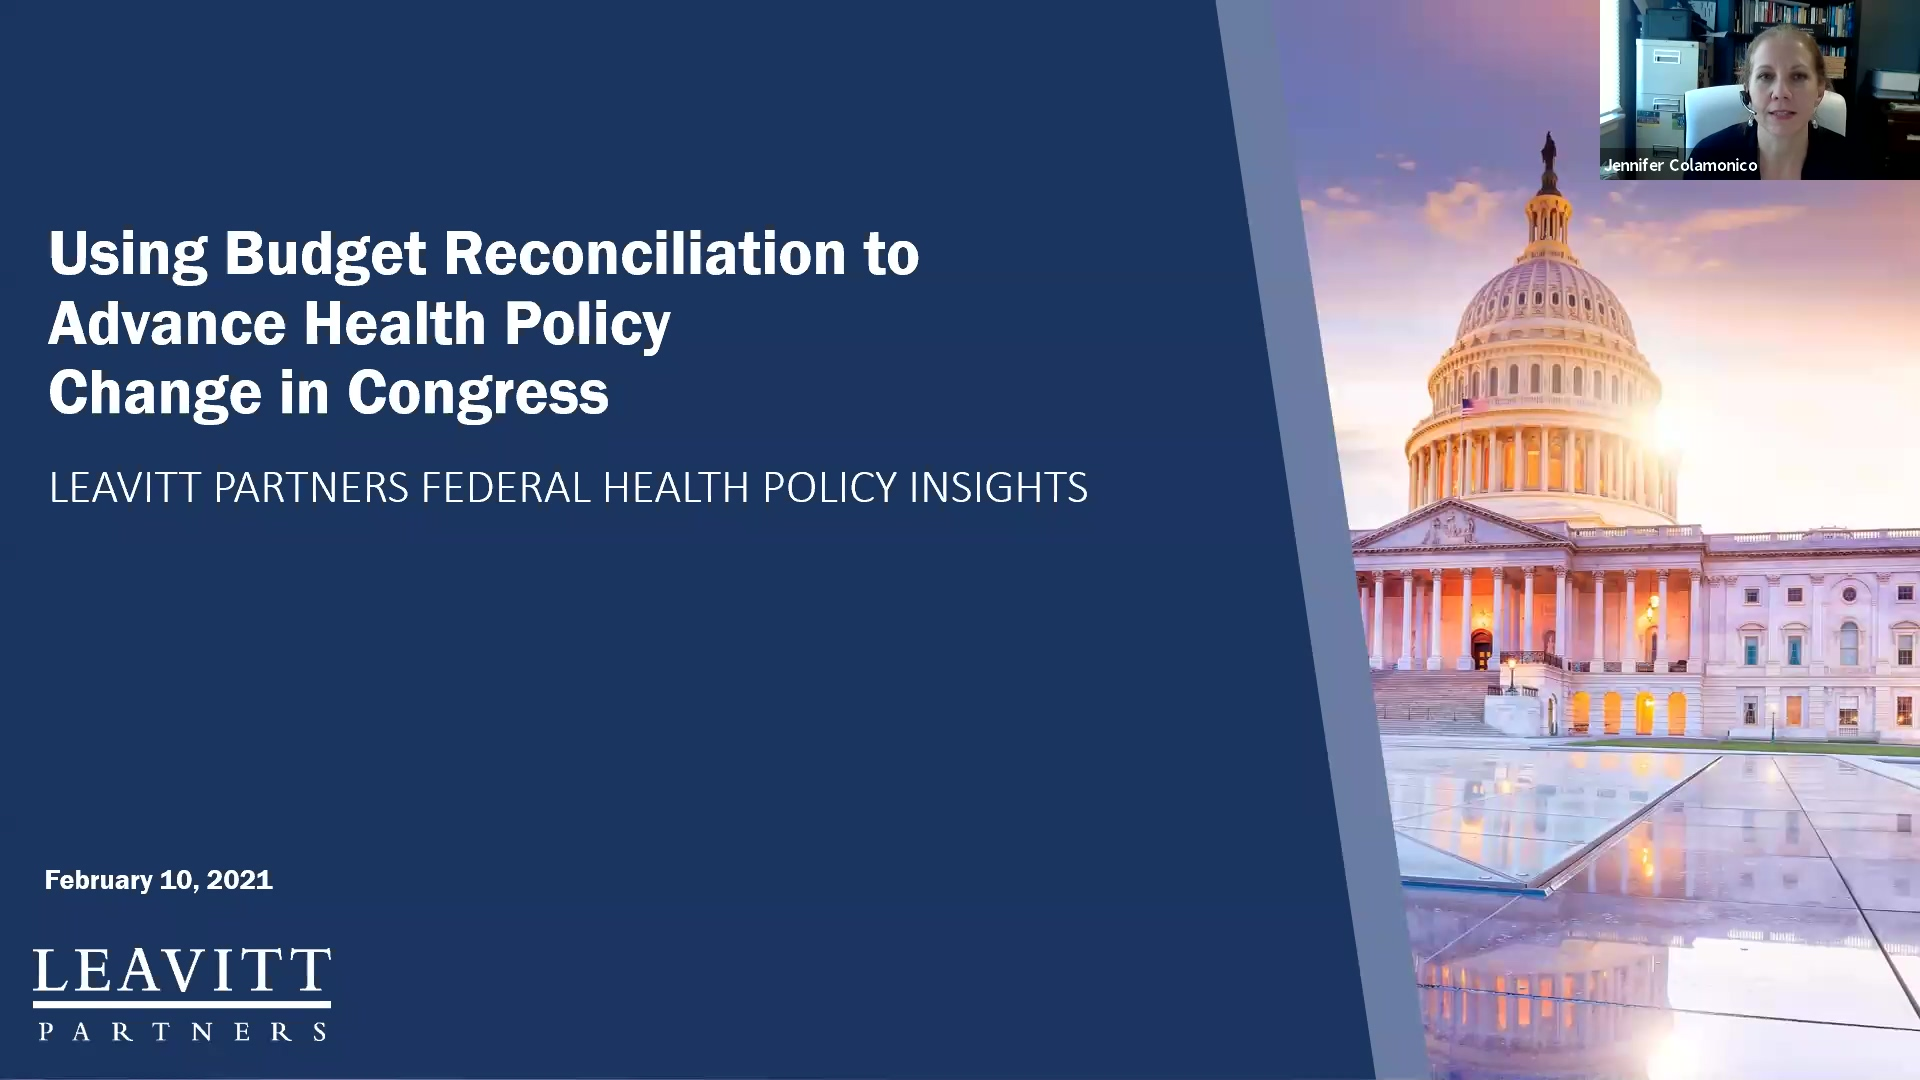 Budget Reconciliation Webinar Recording 2.10.21